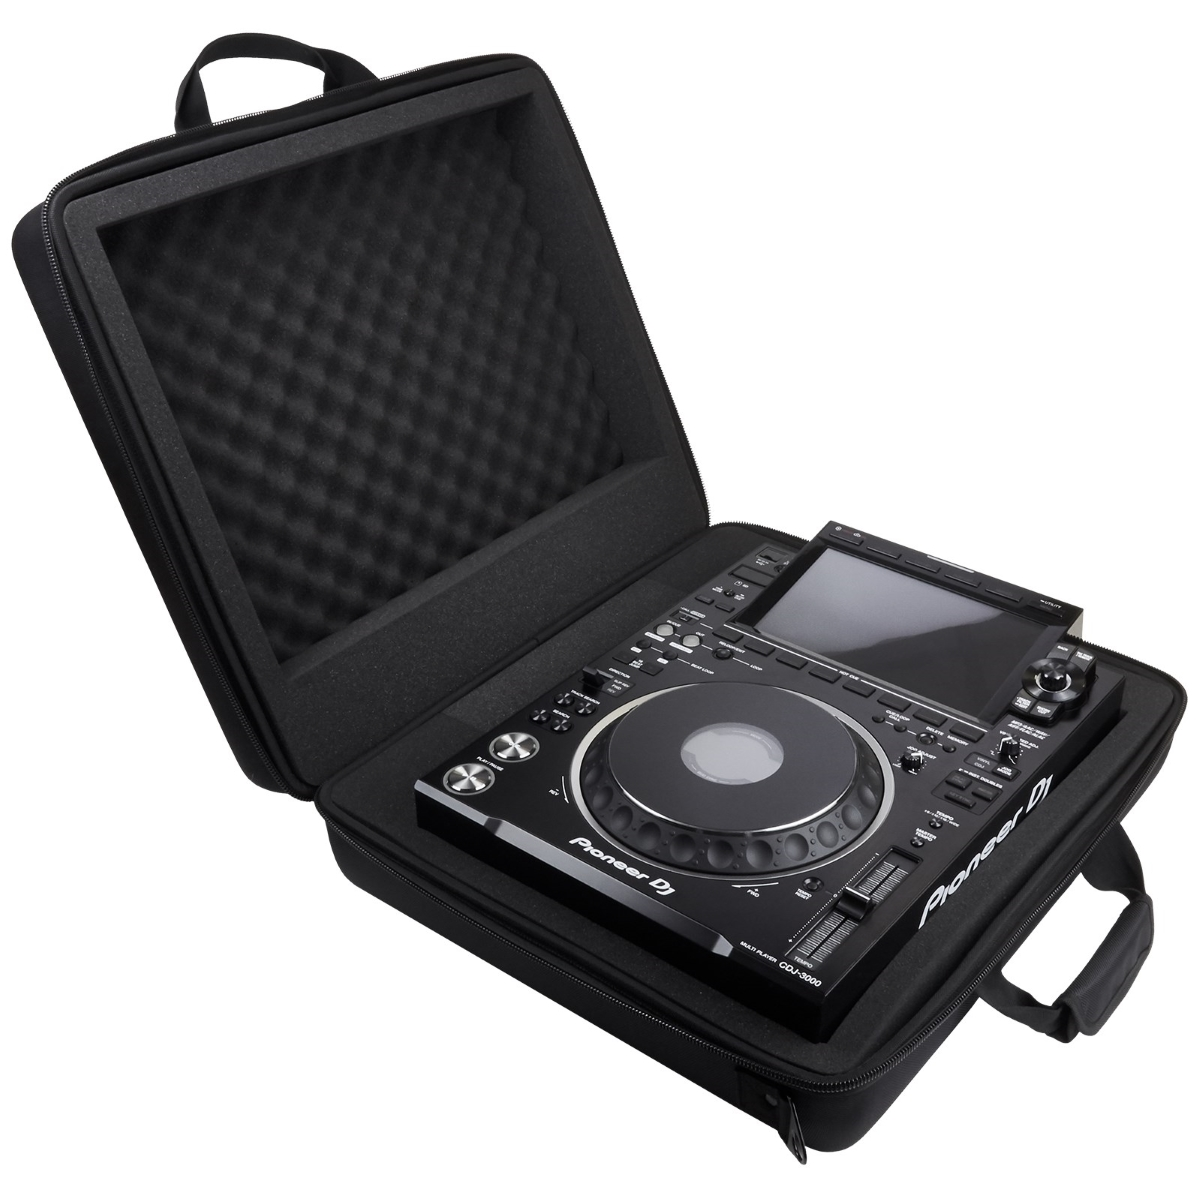 BORSA PIONEER DJC-3000 PER MEDIA PLAYER PIONEER CDJ-3000